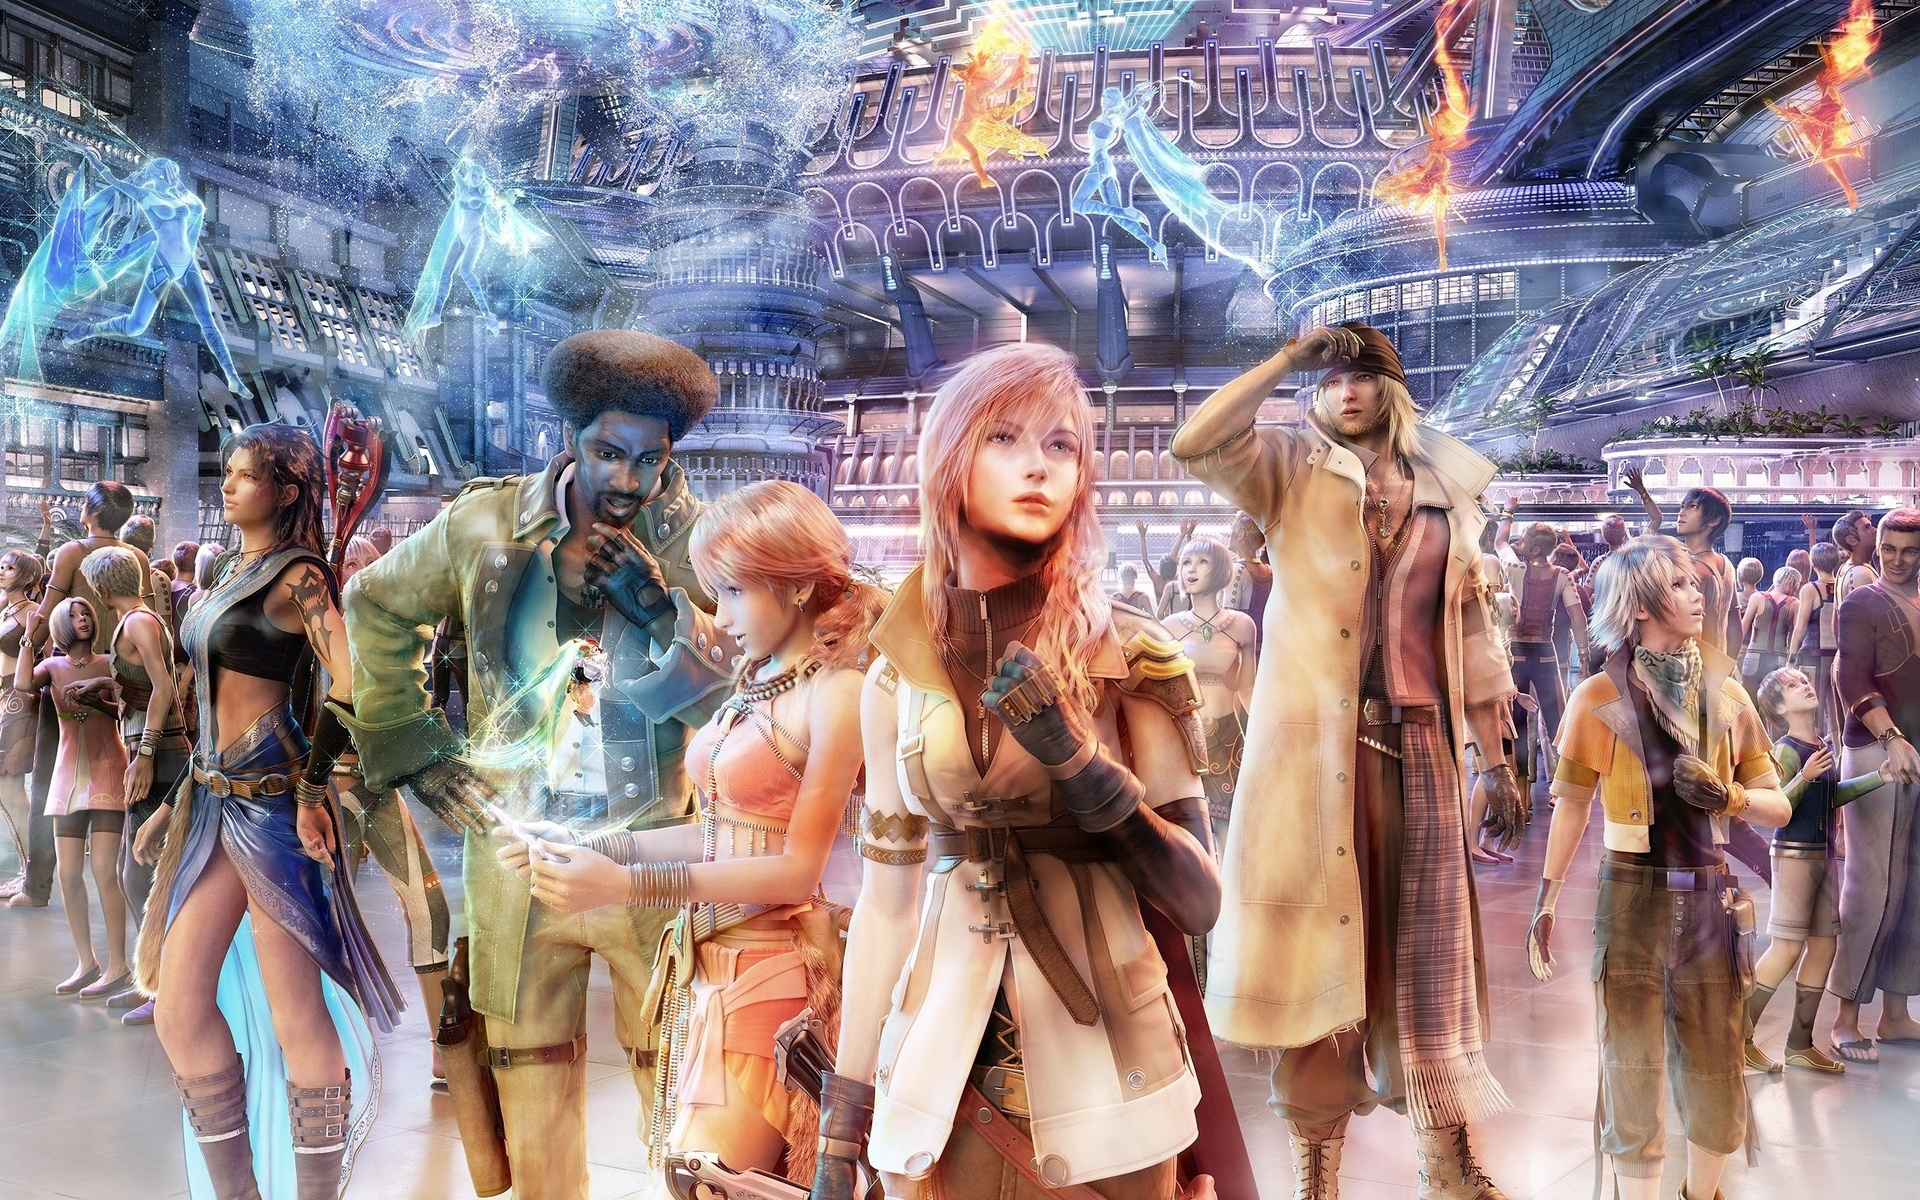 34059 descargar fondo de pantalla Juegos, Final Fantasy: protectores de pantalla e imágenes gratis